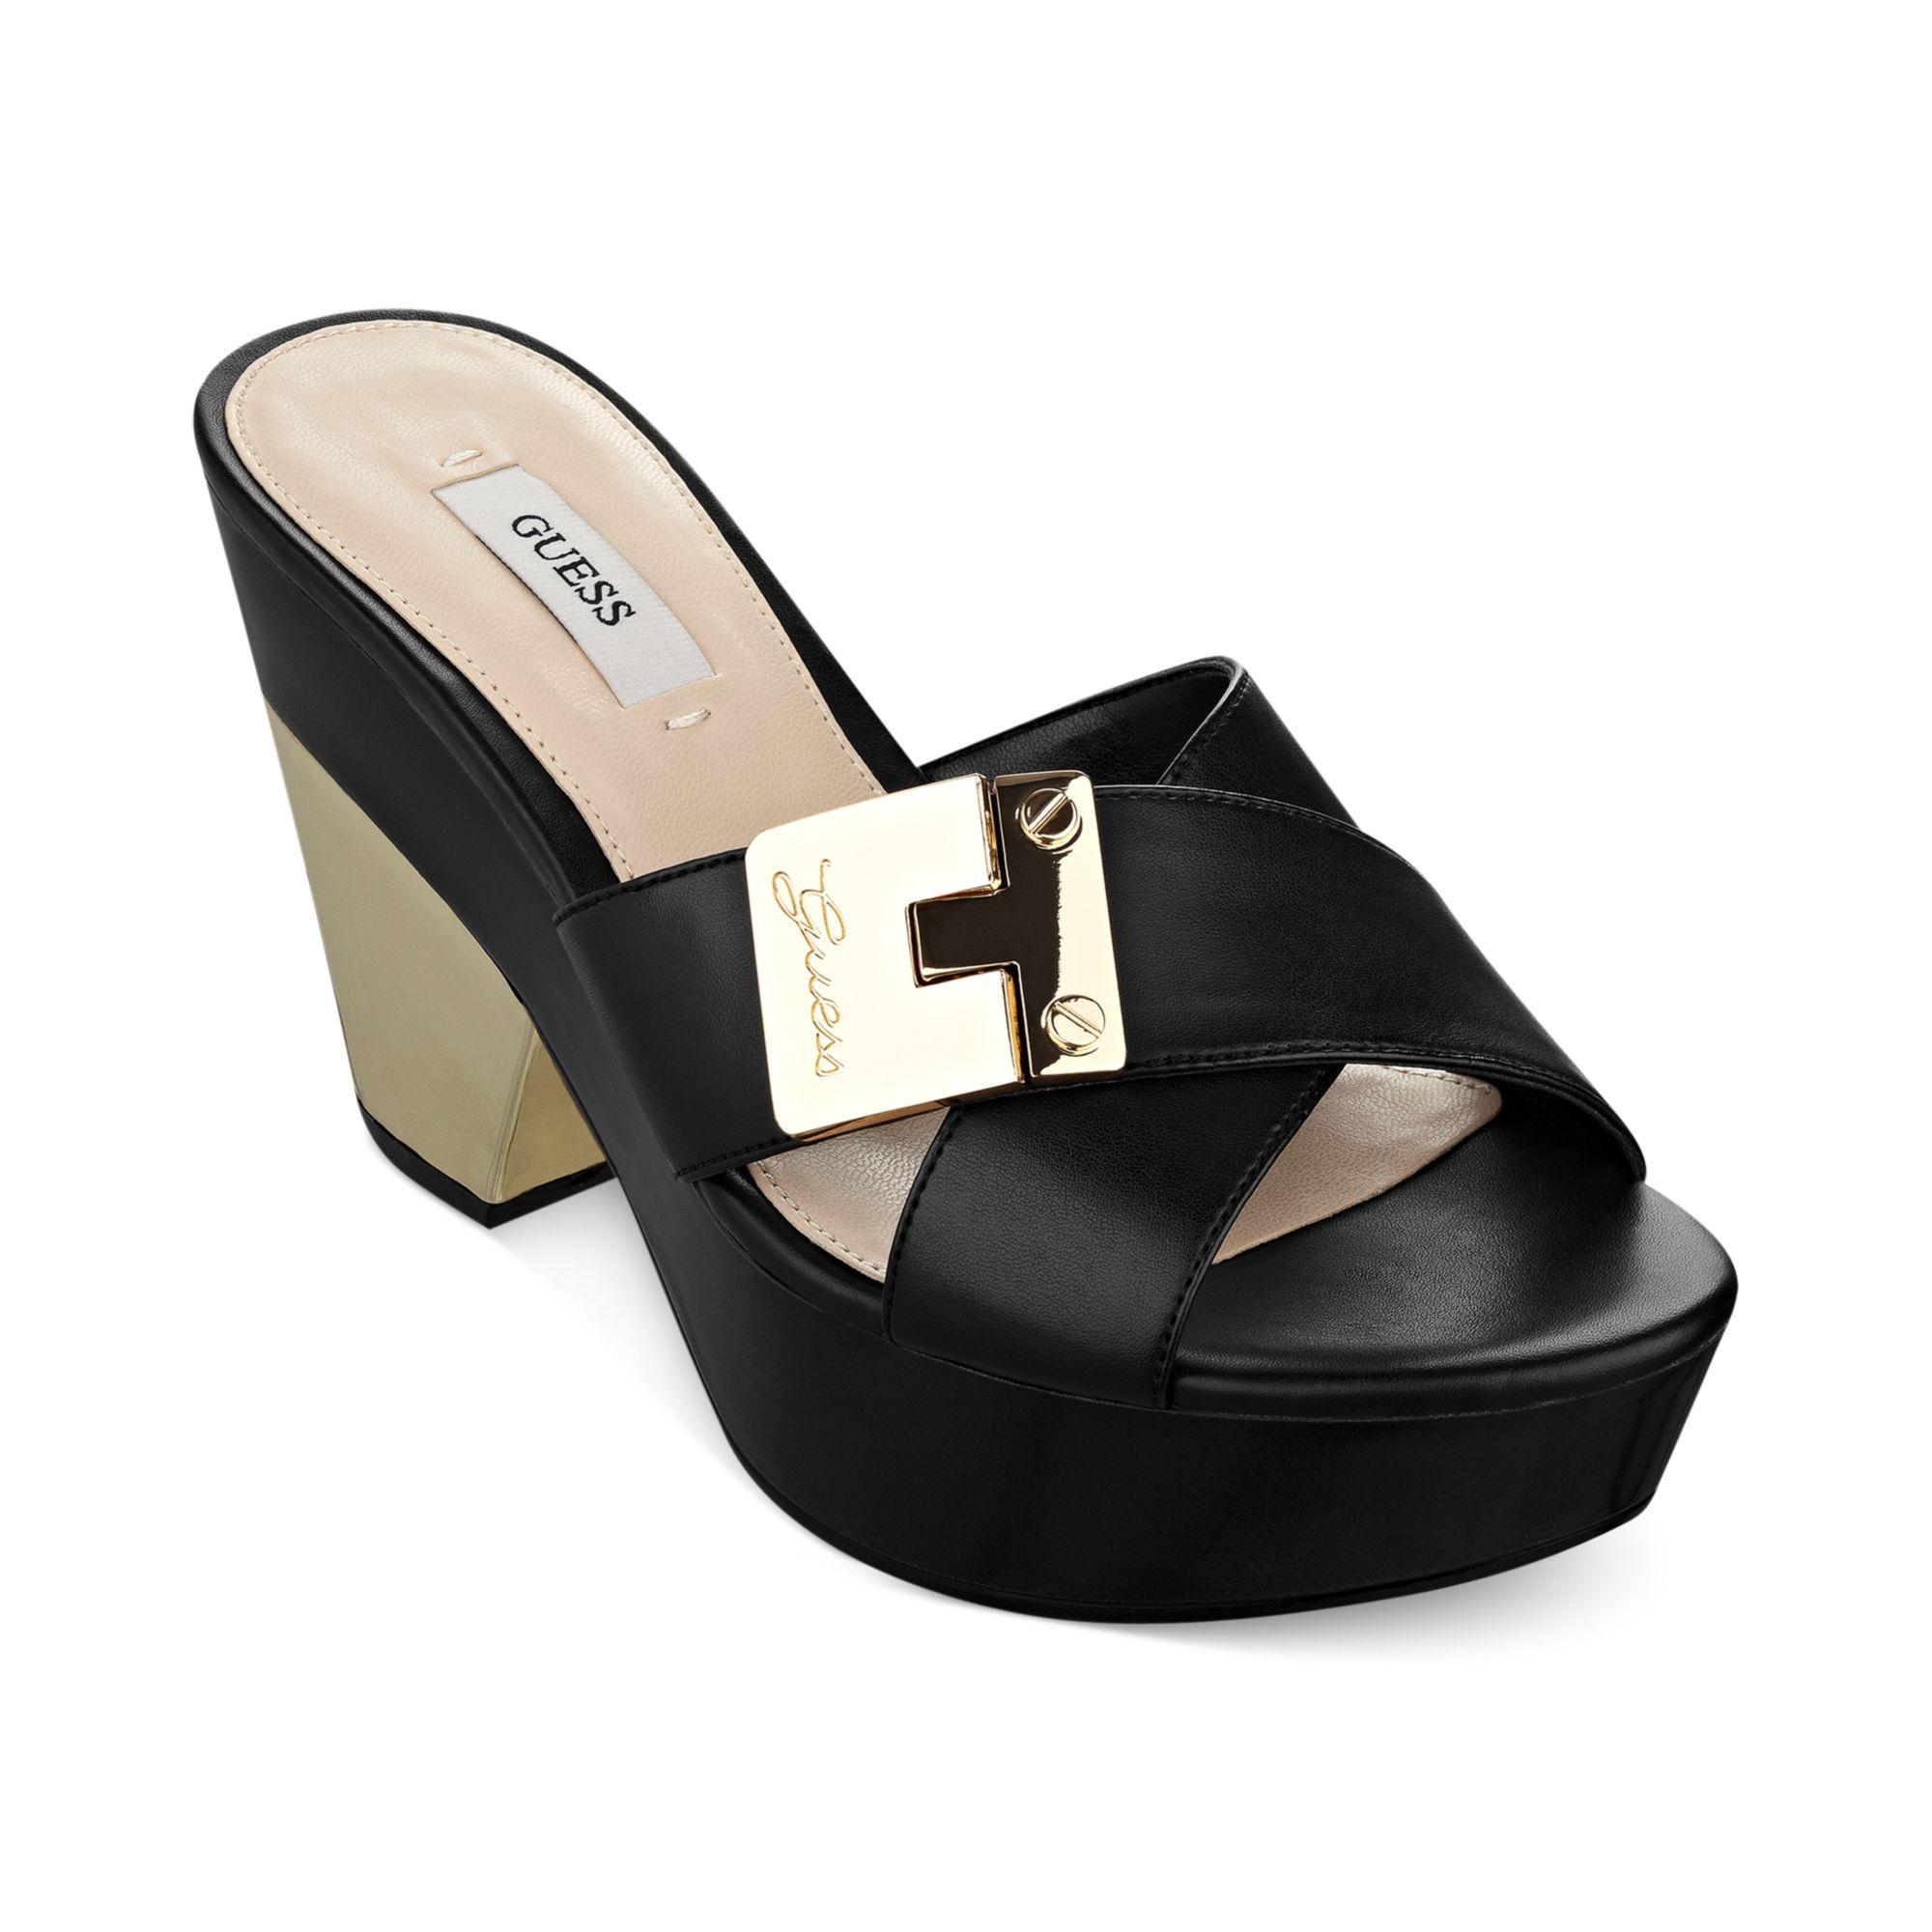 3939421b0cb Lyst - Guess Womens Cresa Platform Slide Sandals in Black